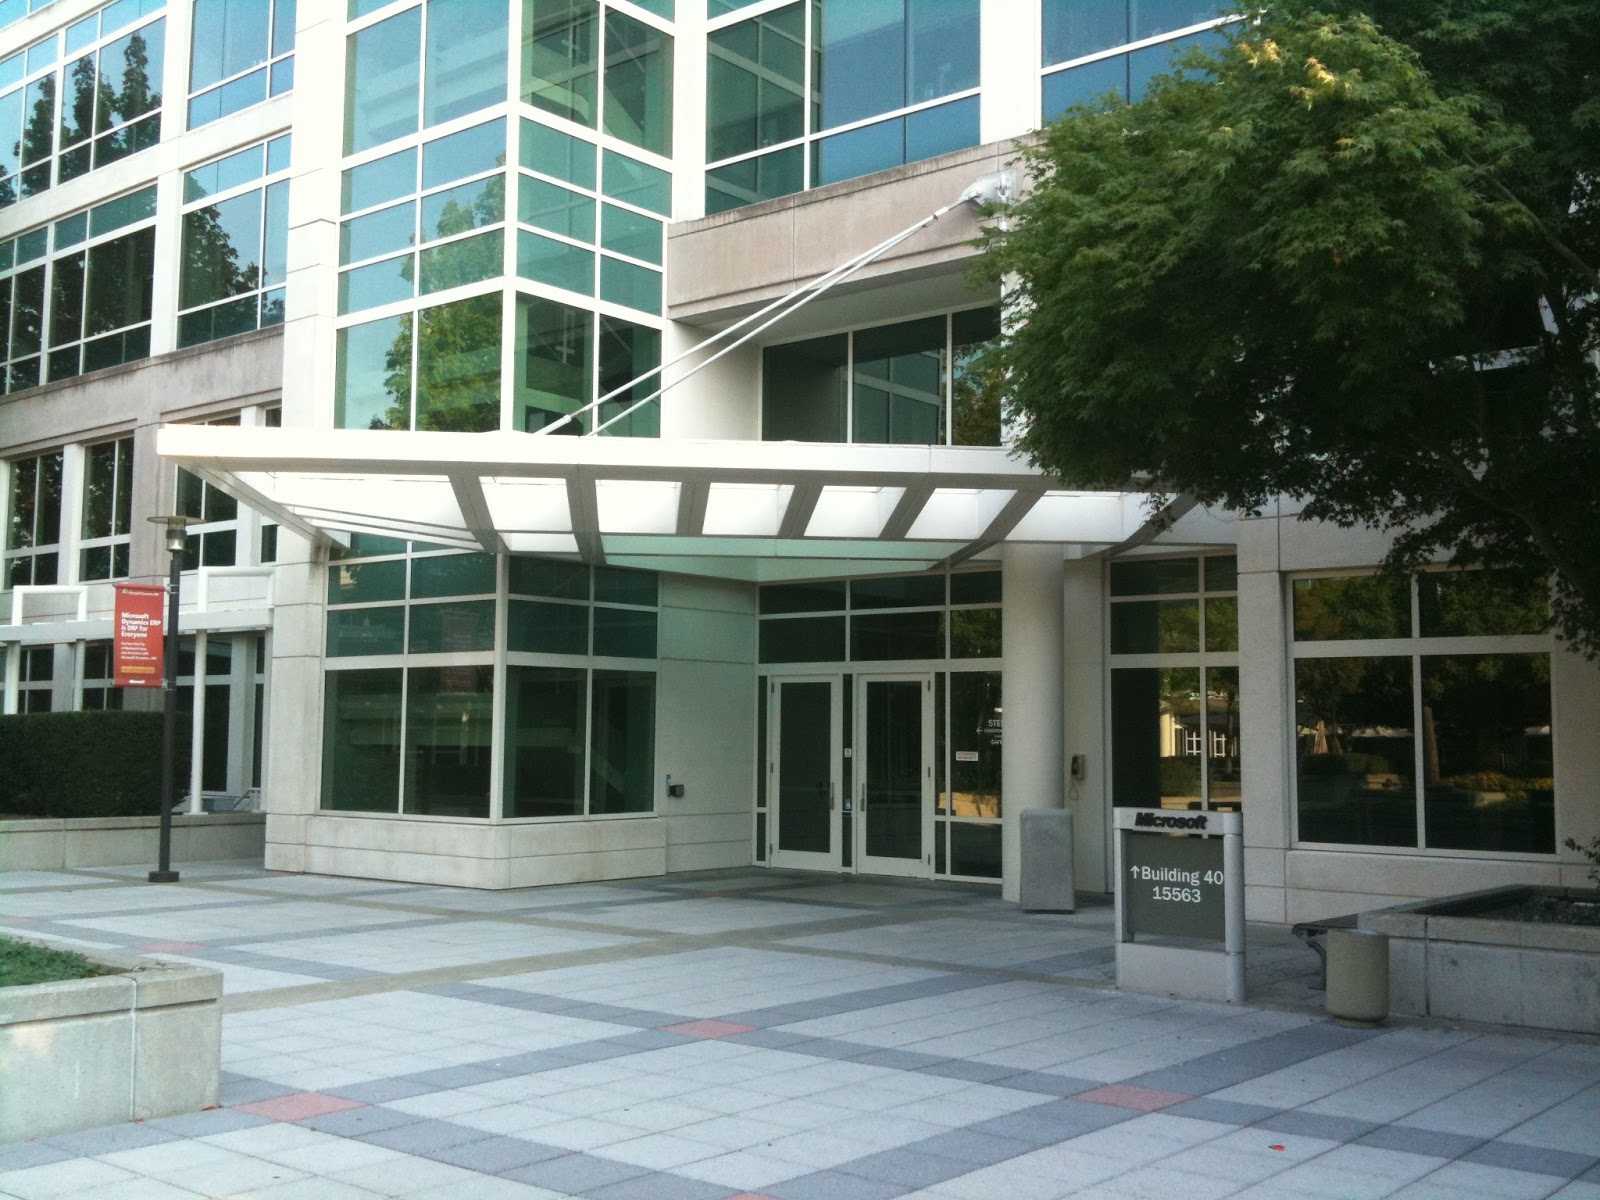 Building 92 microsoft store - Microsoft Building 40